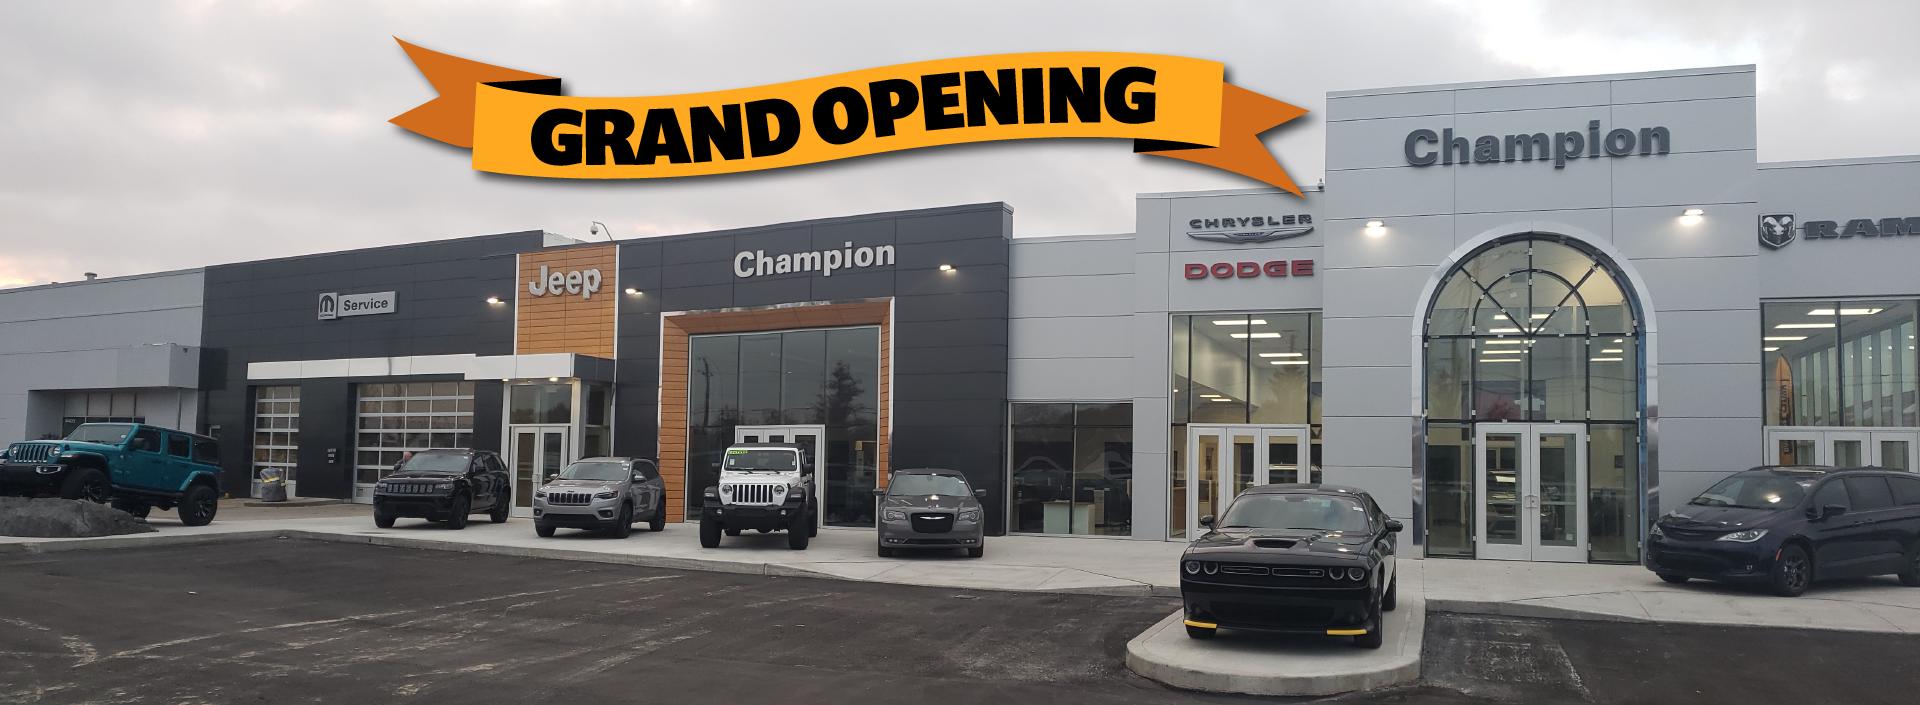 Champion New Storefront Grand Opening